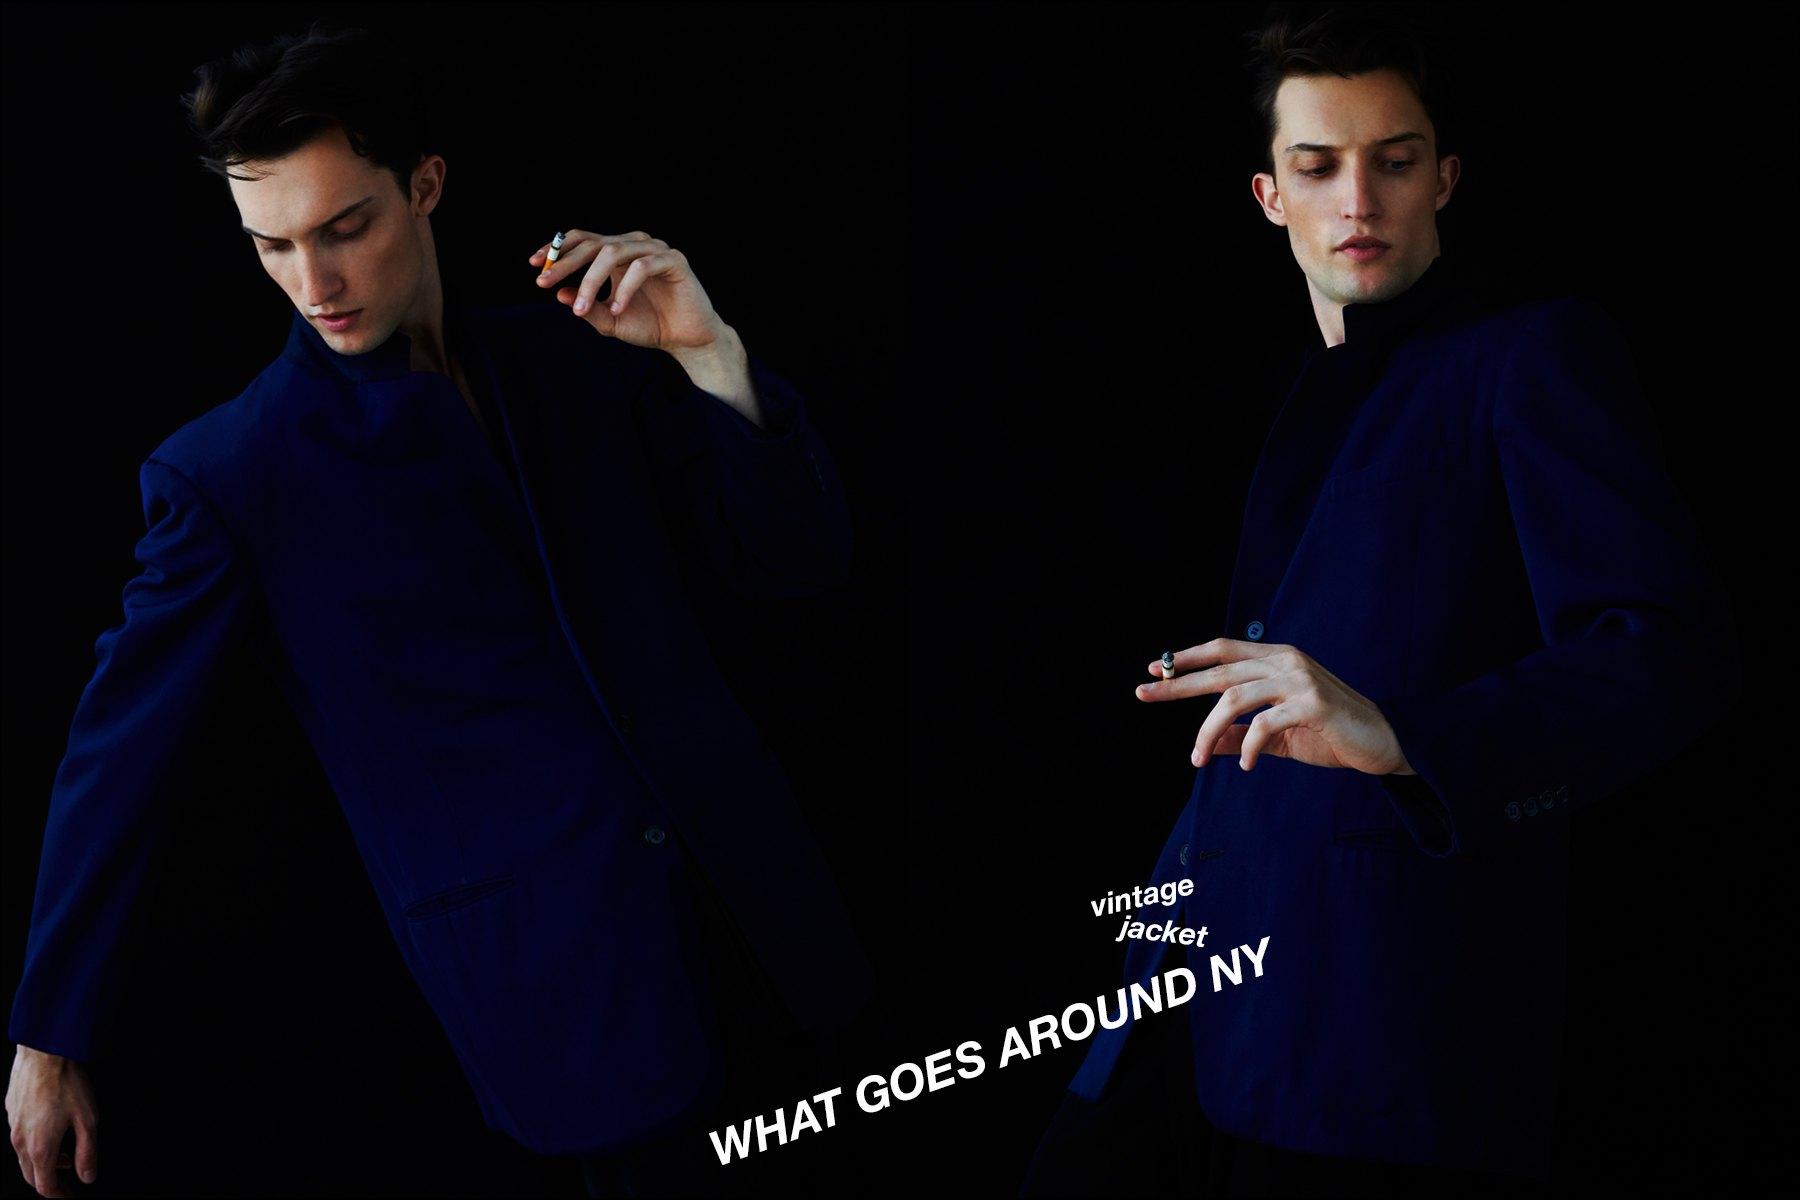 Max Von Isser for Ponyboy magazine menswear vintage jacket editorial. Photographed by Alexander Thompson in New York City.